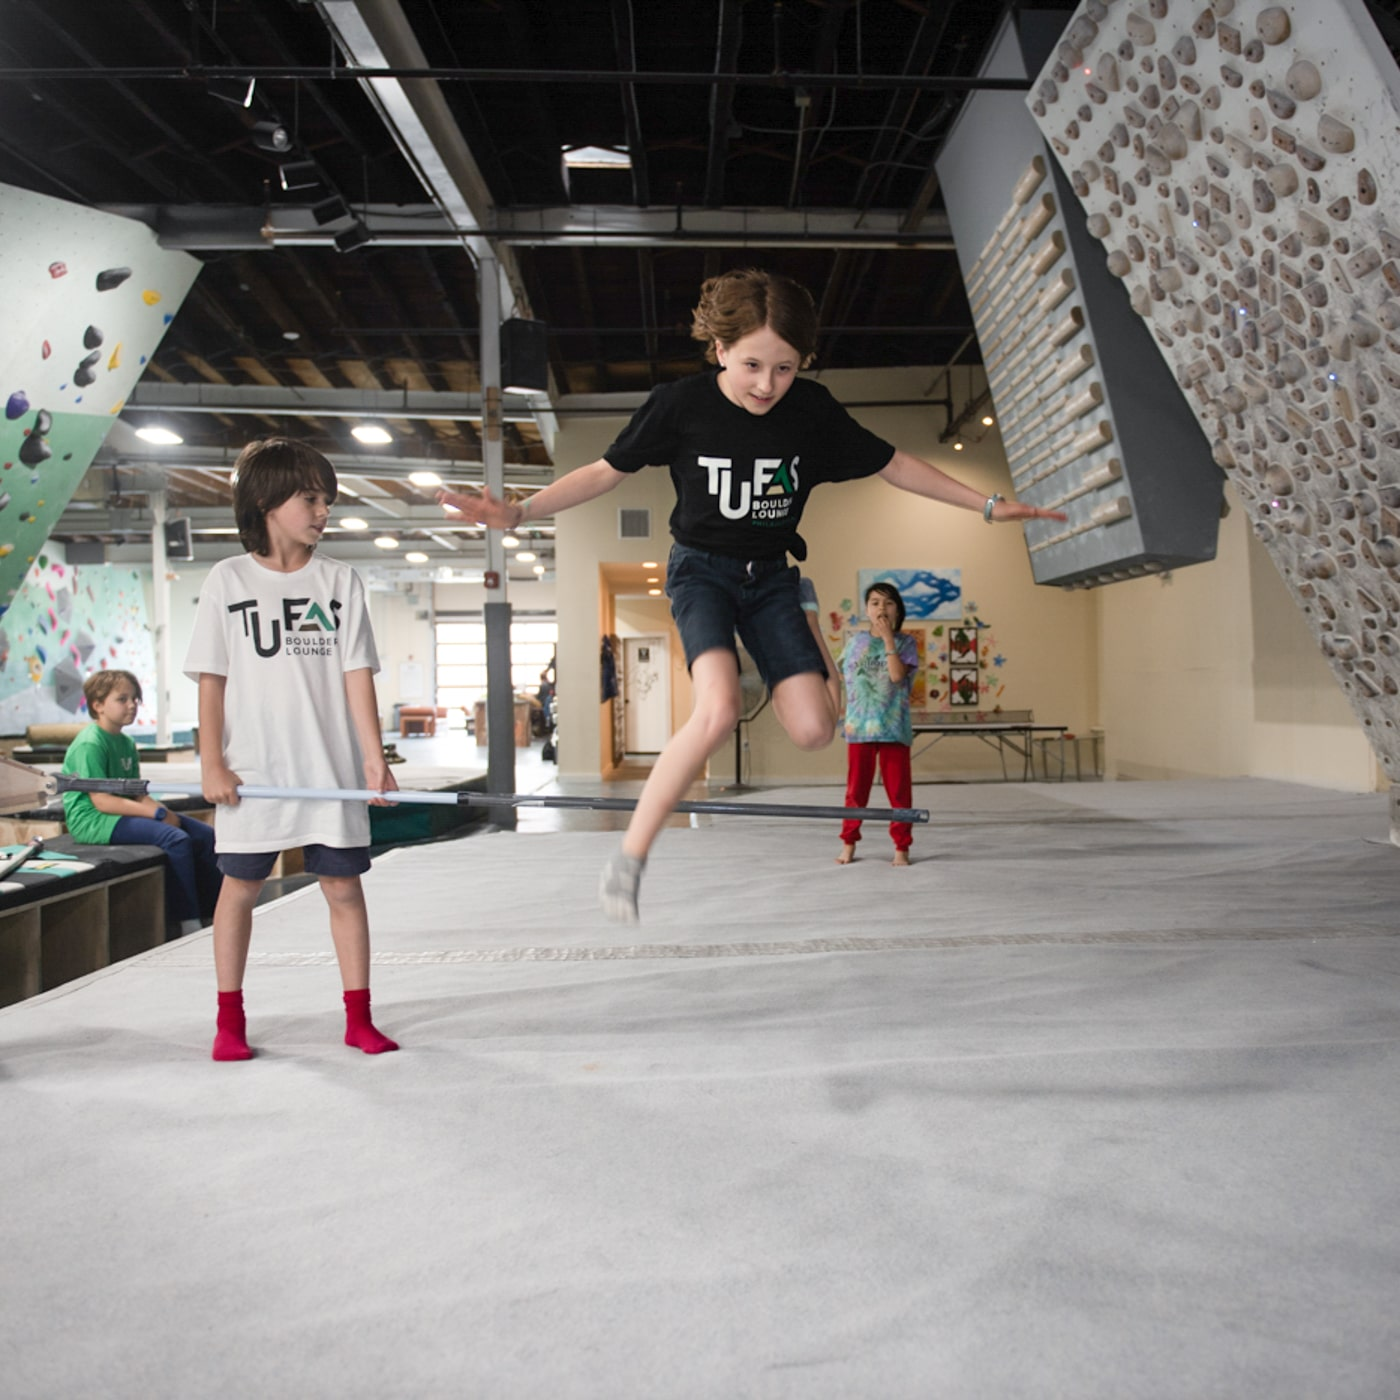 Team Tufas jumping for joy